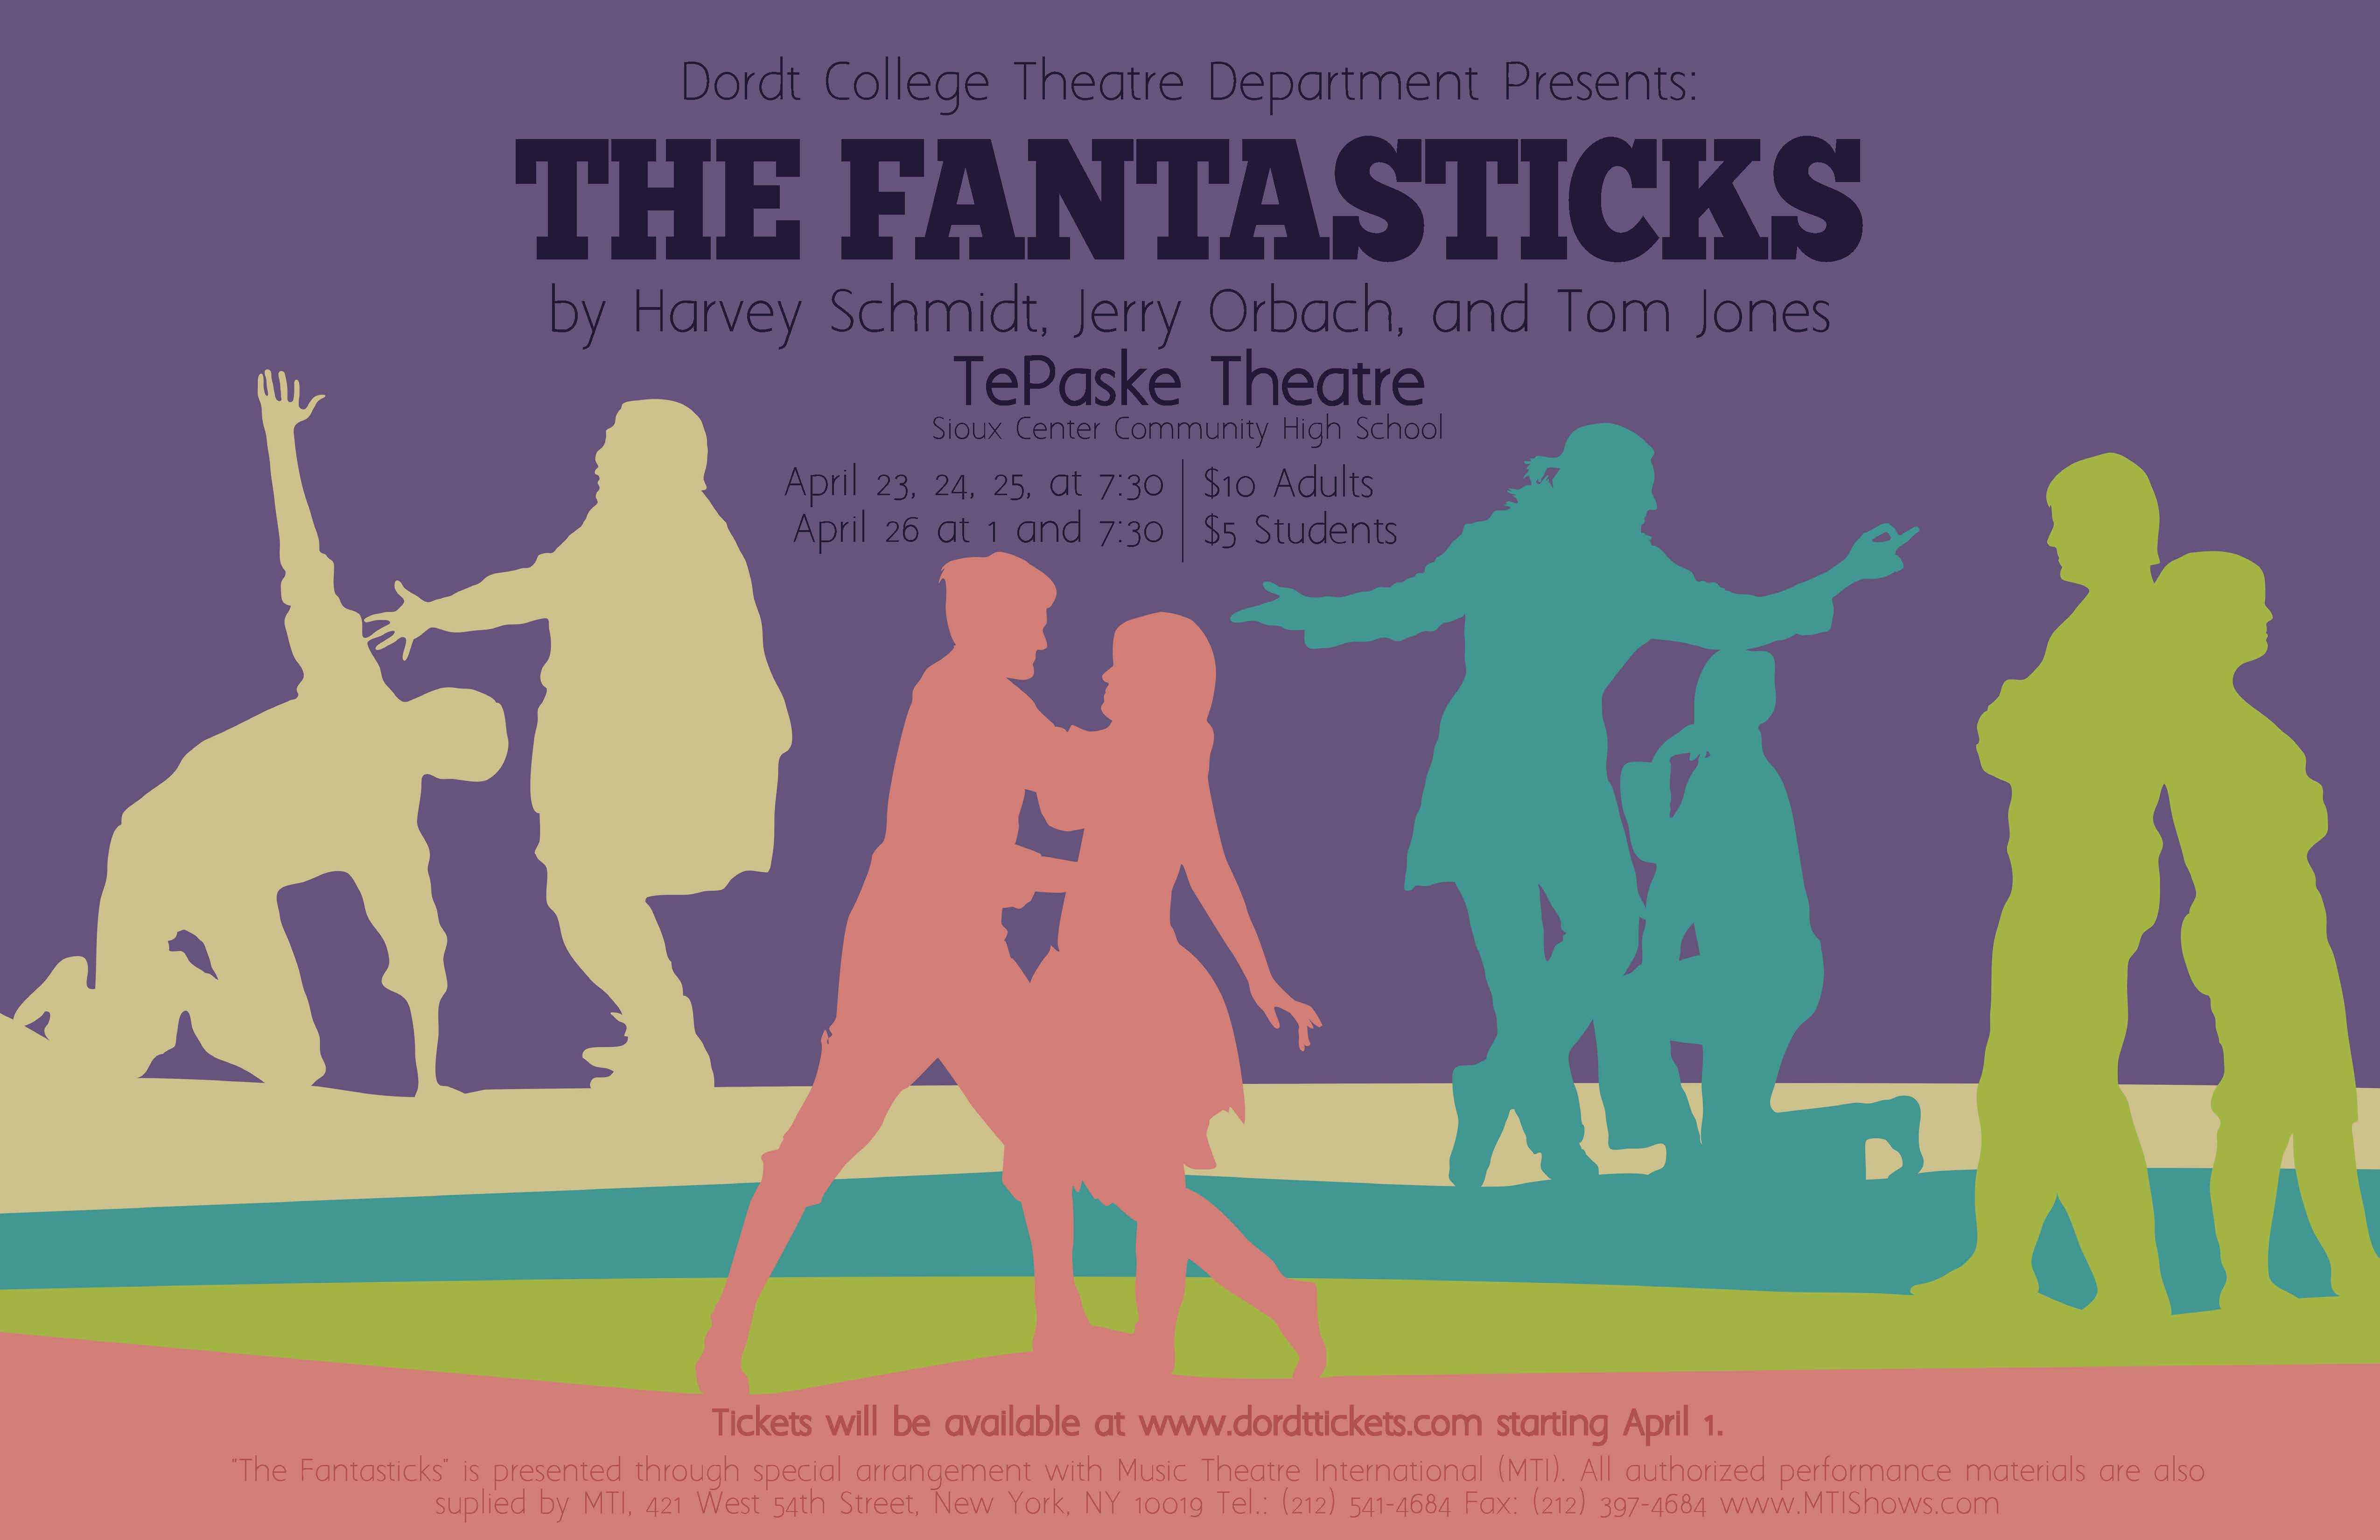 Final fantasticks